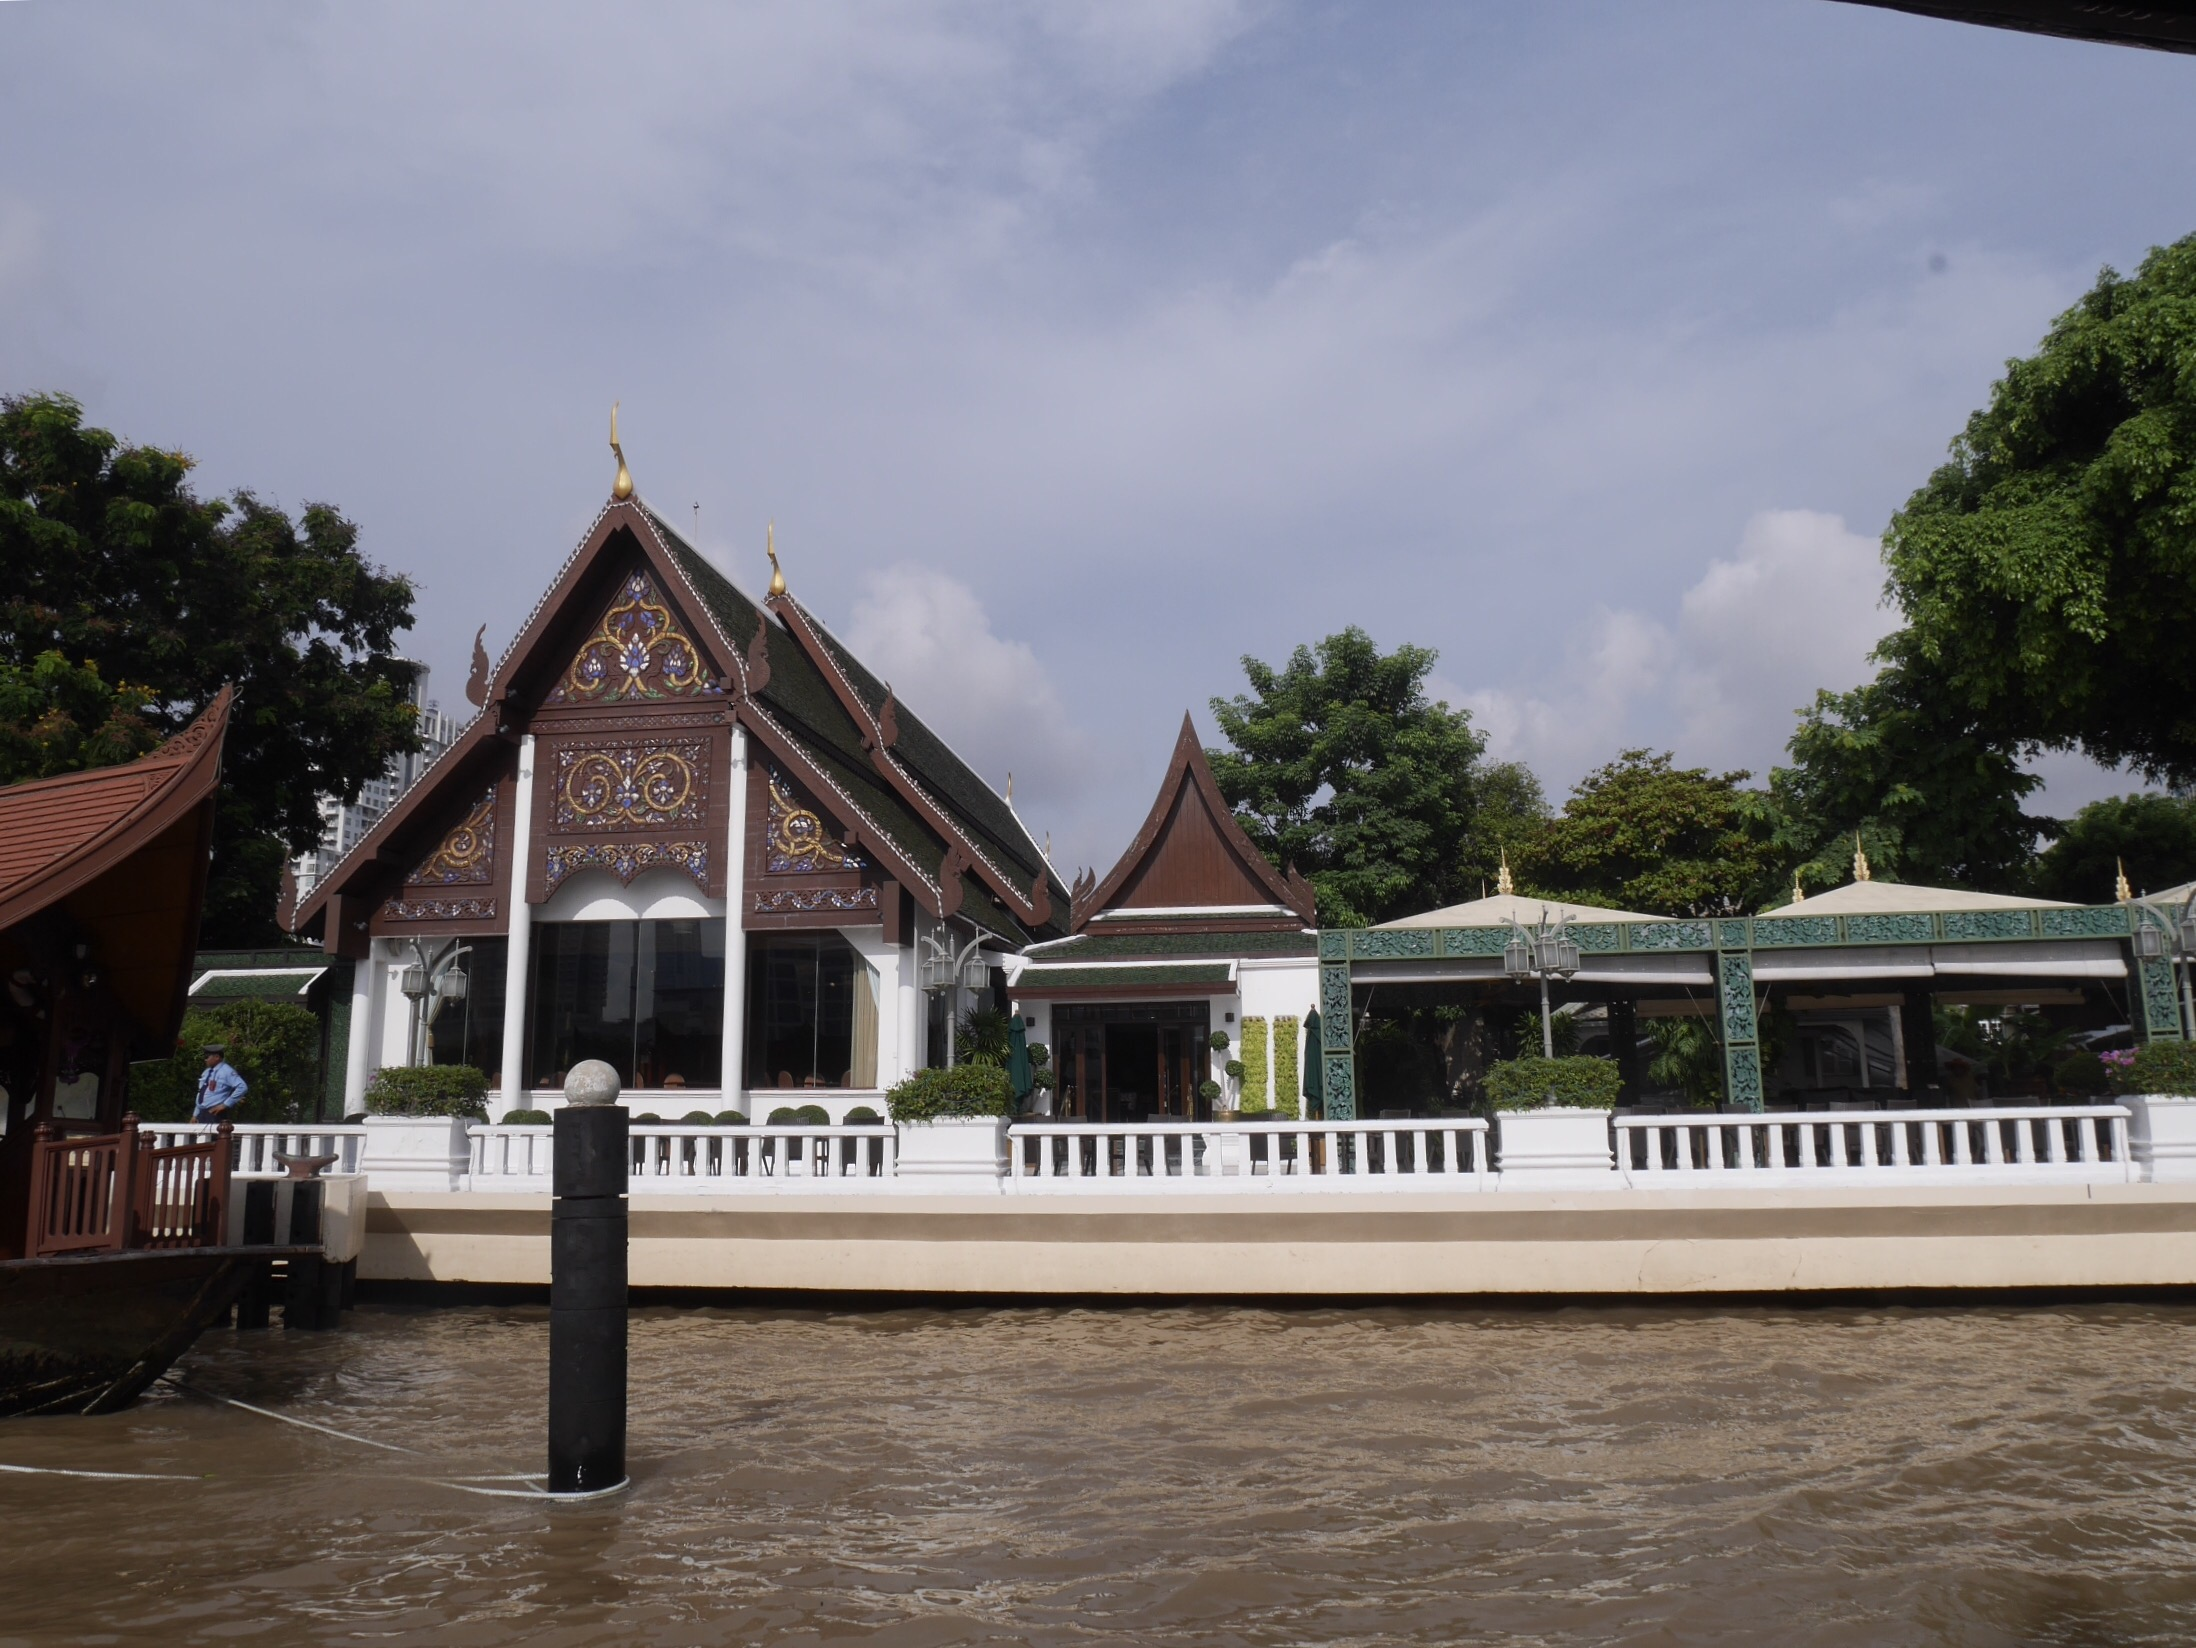 img 9110 - The Oriental Thai Cooking School - マンダリンオリエンタルバンコクのおもてなし空間で体験する絶品タイ料理教室